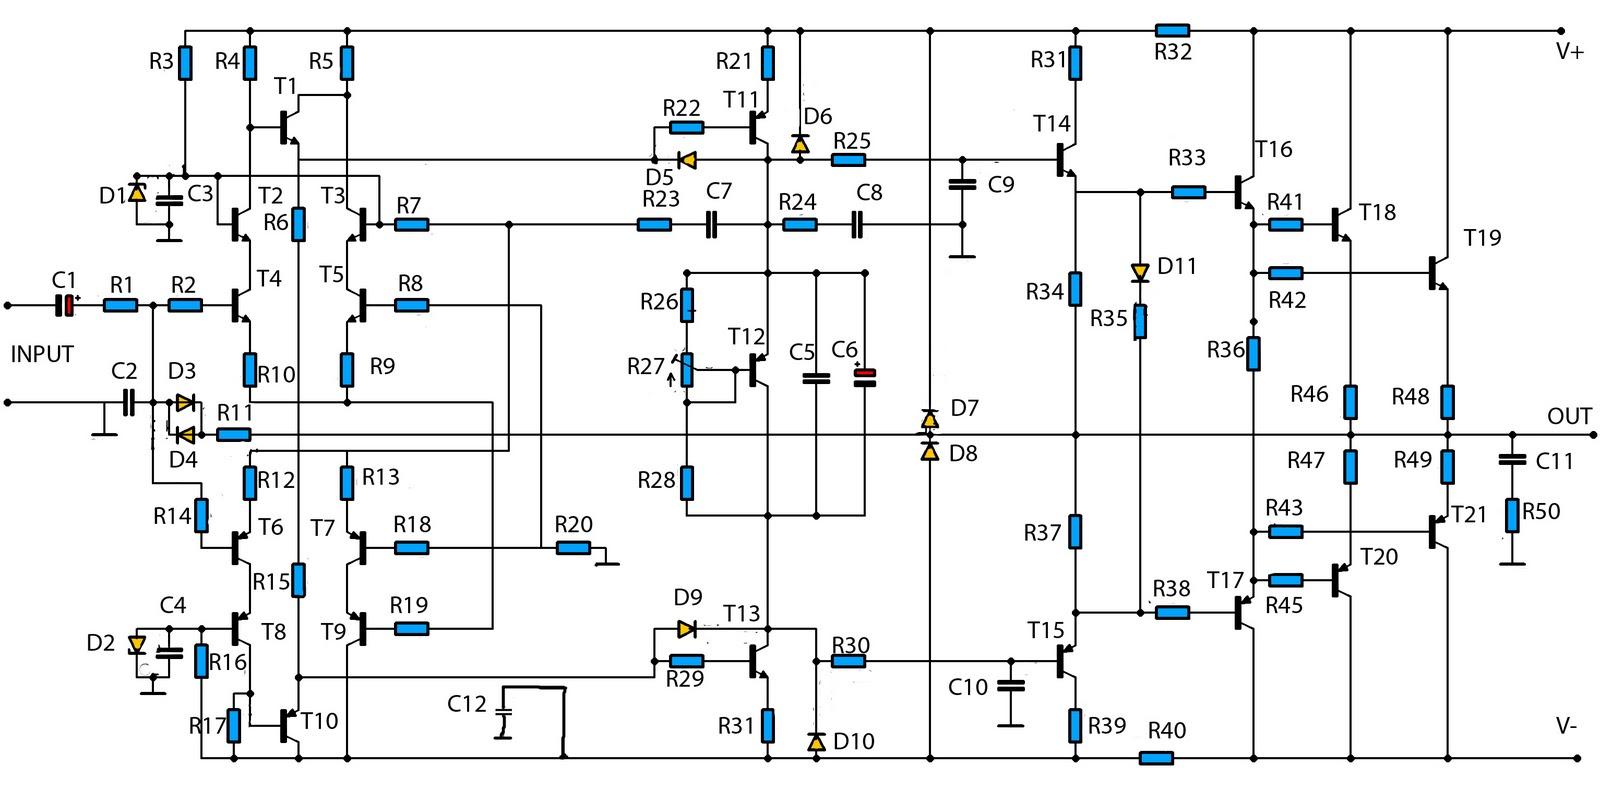 1500 Watts Power Amplifier Circuit Diagram All Kind Of Wiring Watt High 1400w Audio Rh Ampcircuitdiagram Xyz Schematic